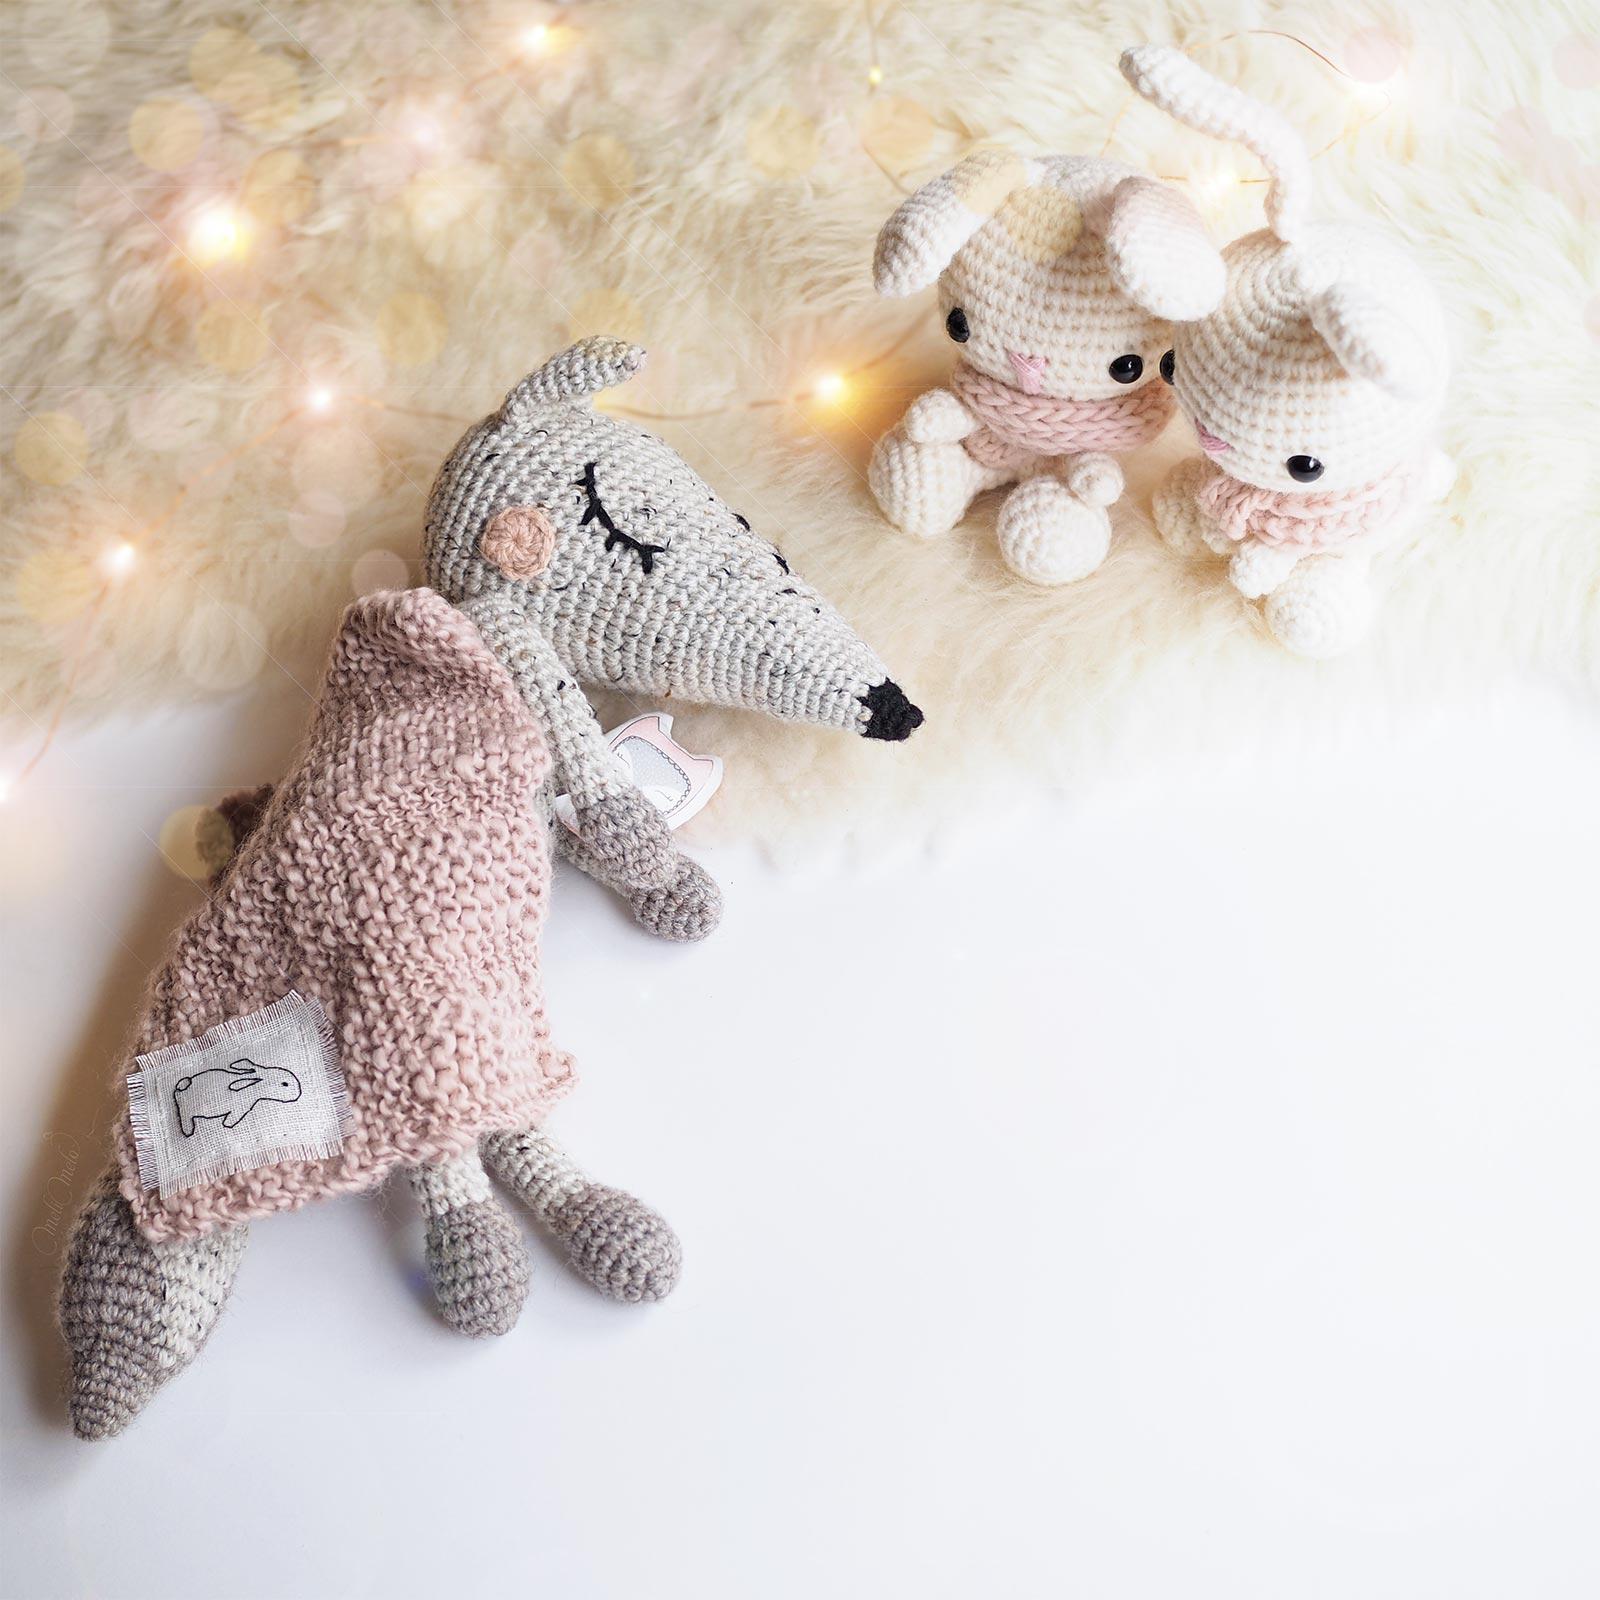 doudous luppi loup kezafoflo lapin crochet allaboutami plaid tricot kawai laboutiquedemelimelo